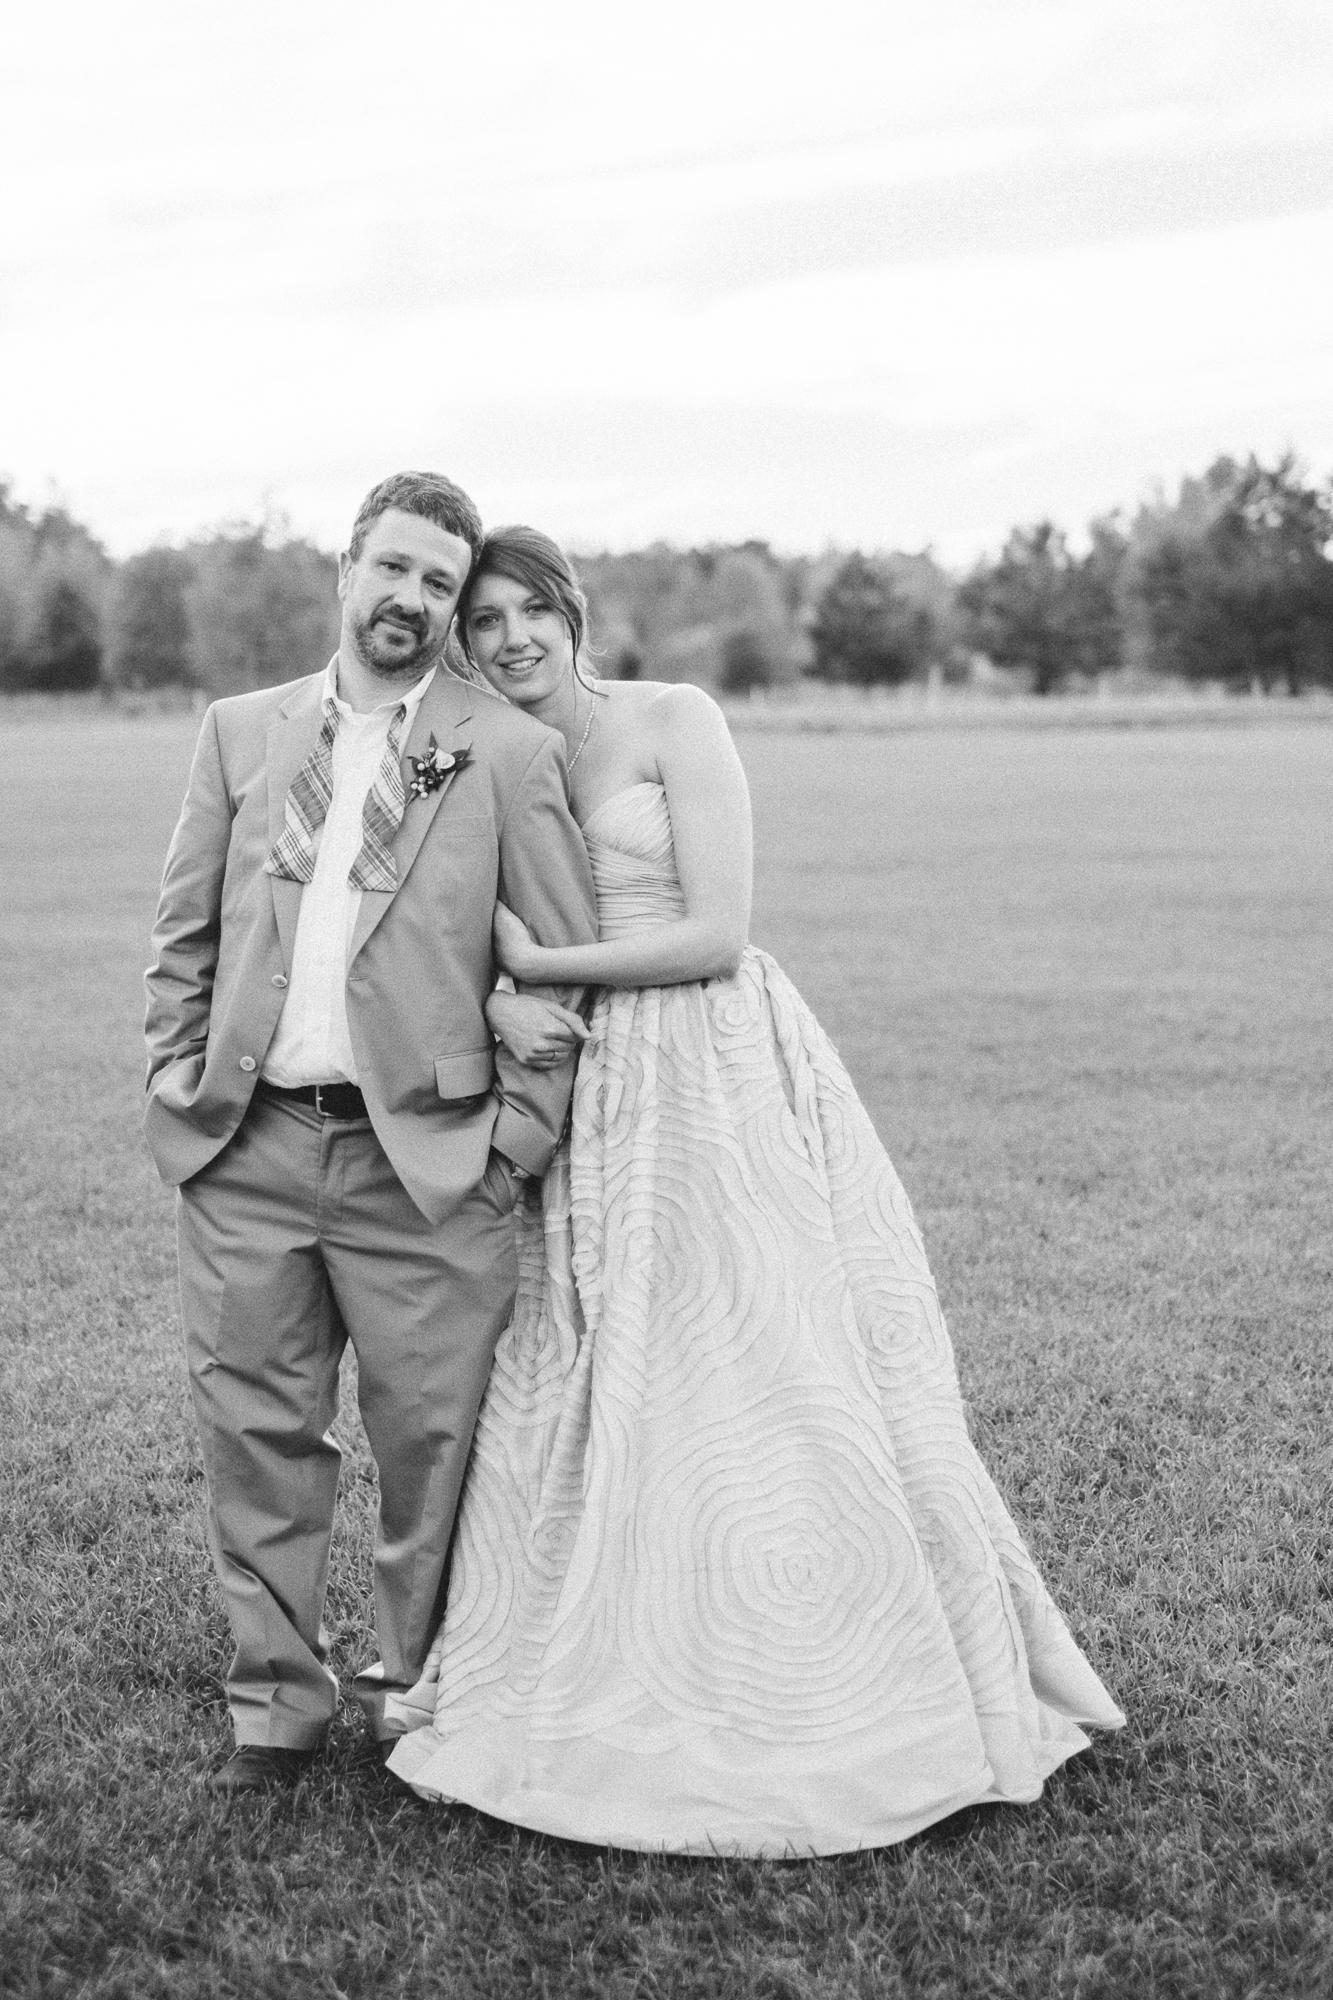 Langley-Smith-wedding-blog-33.jpg